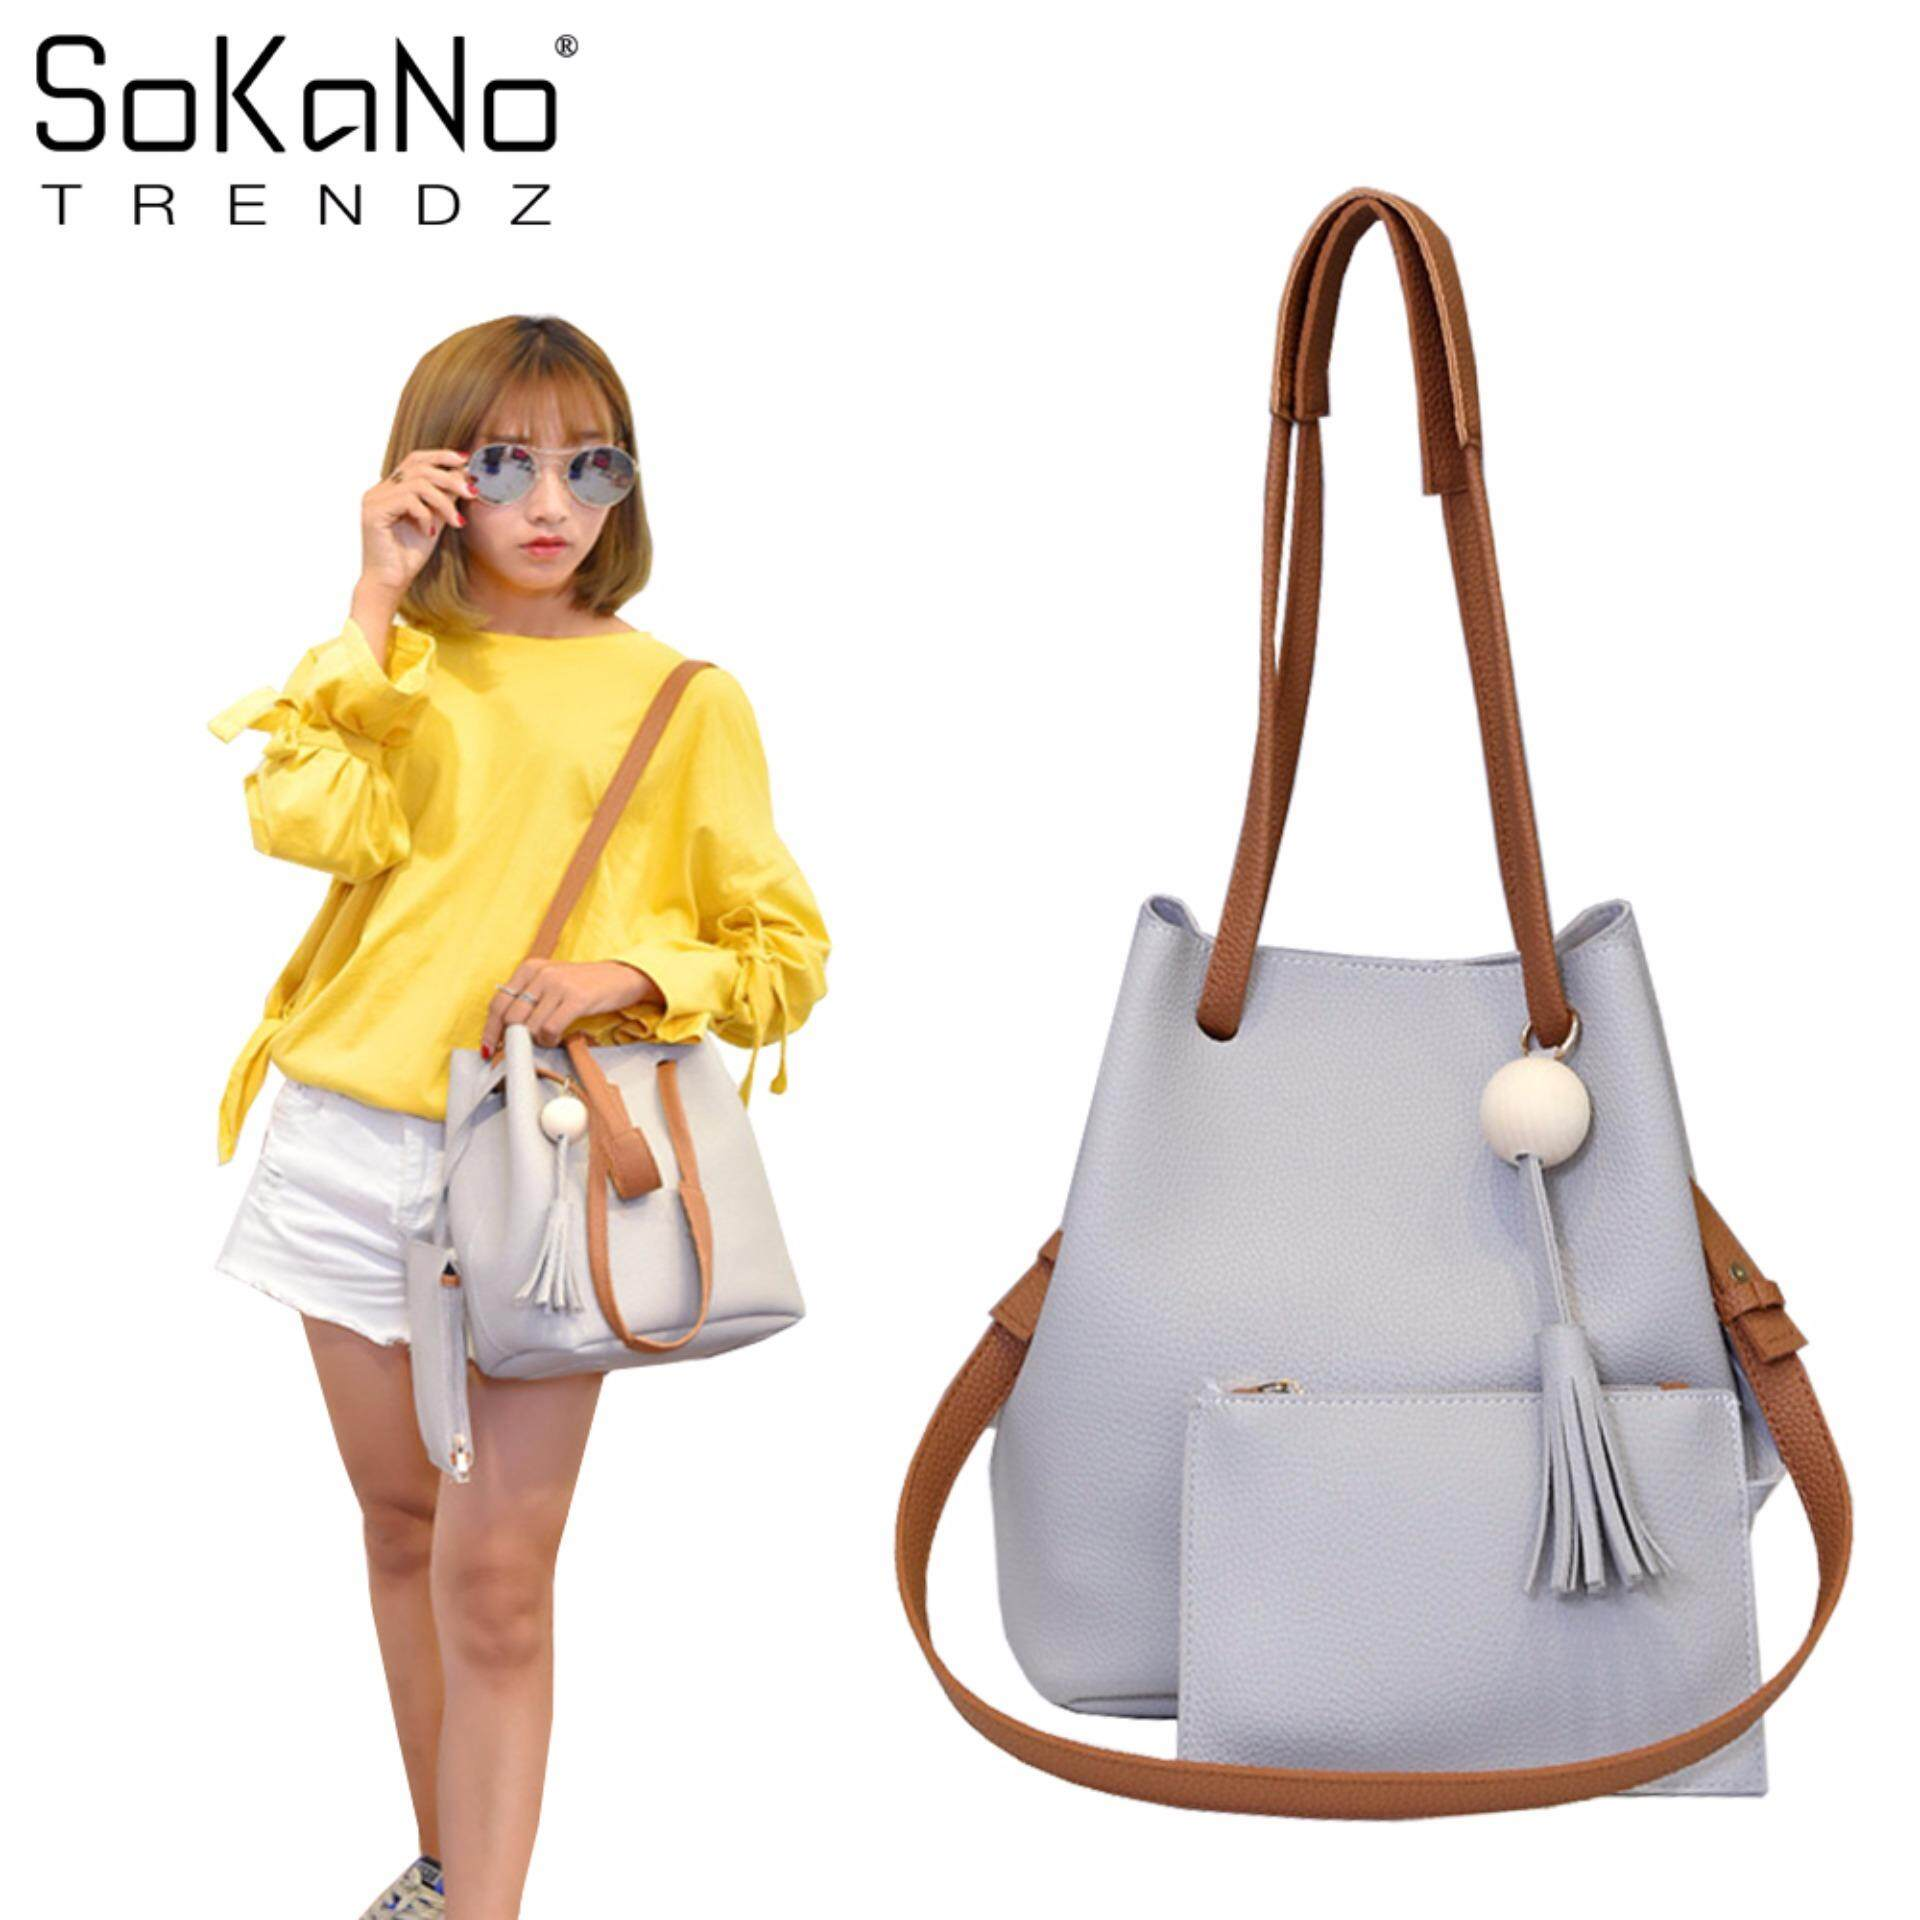 SoKaNo Trendz SKN830 Set of 2 PU Leather Bucket Shoulder Bag with Long Strap Handbeg Wanita - Grey